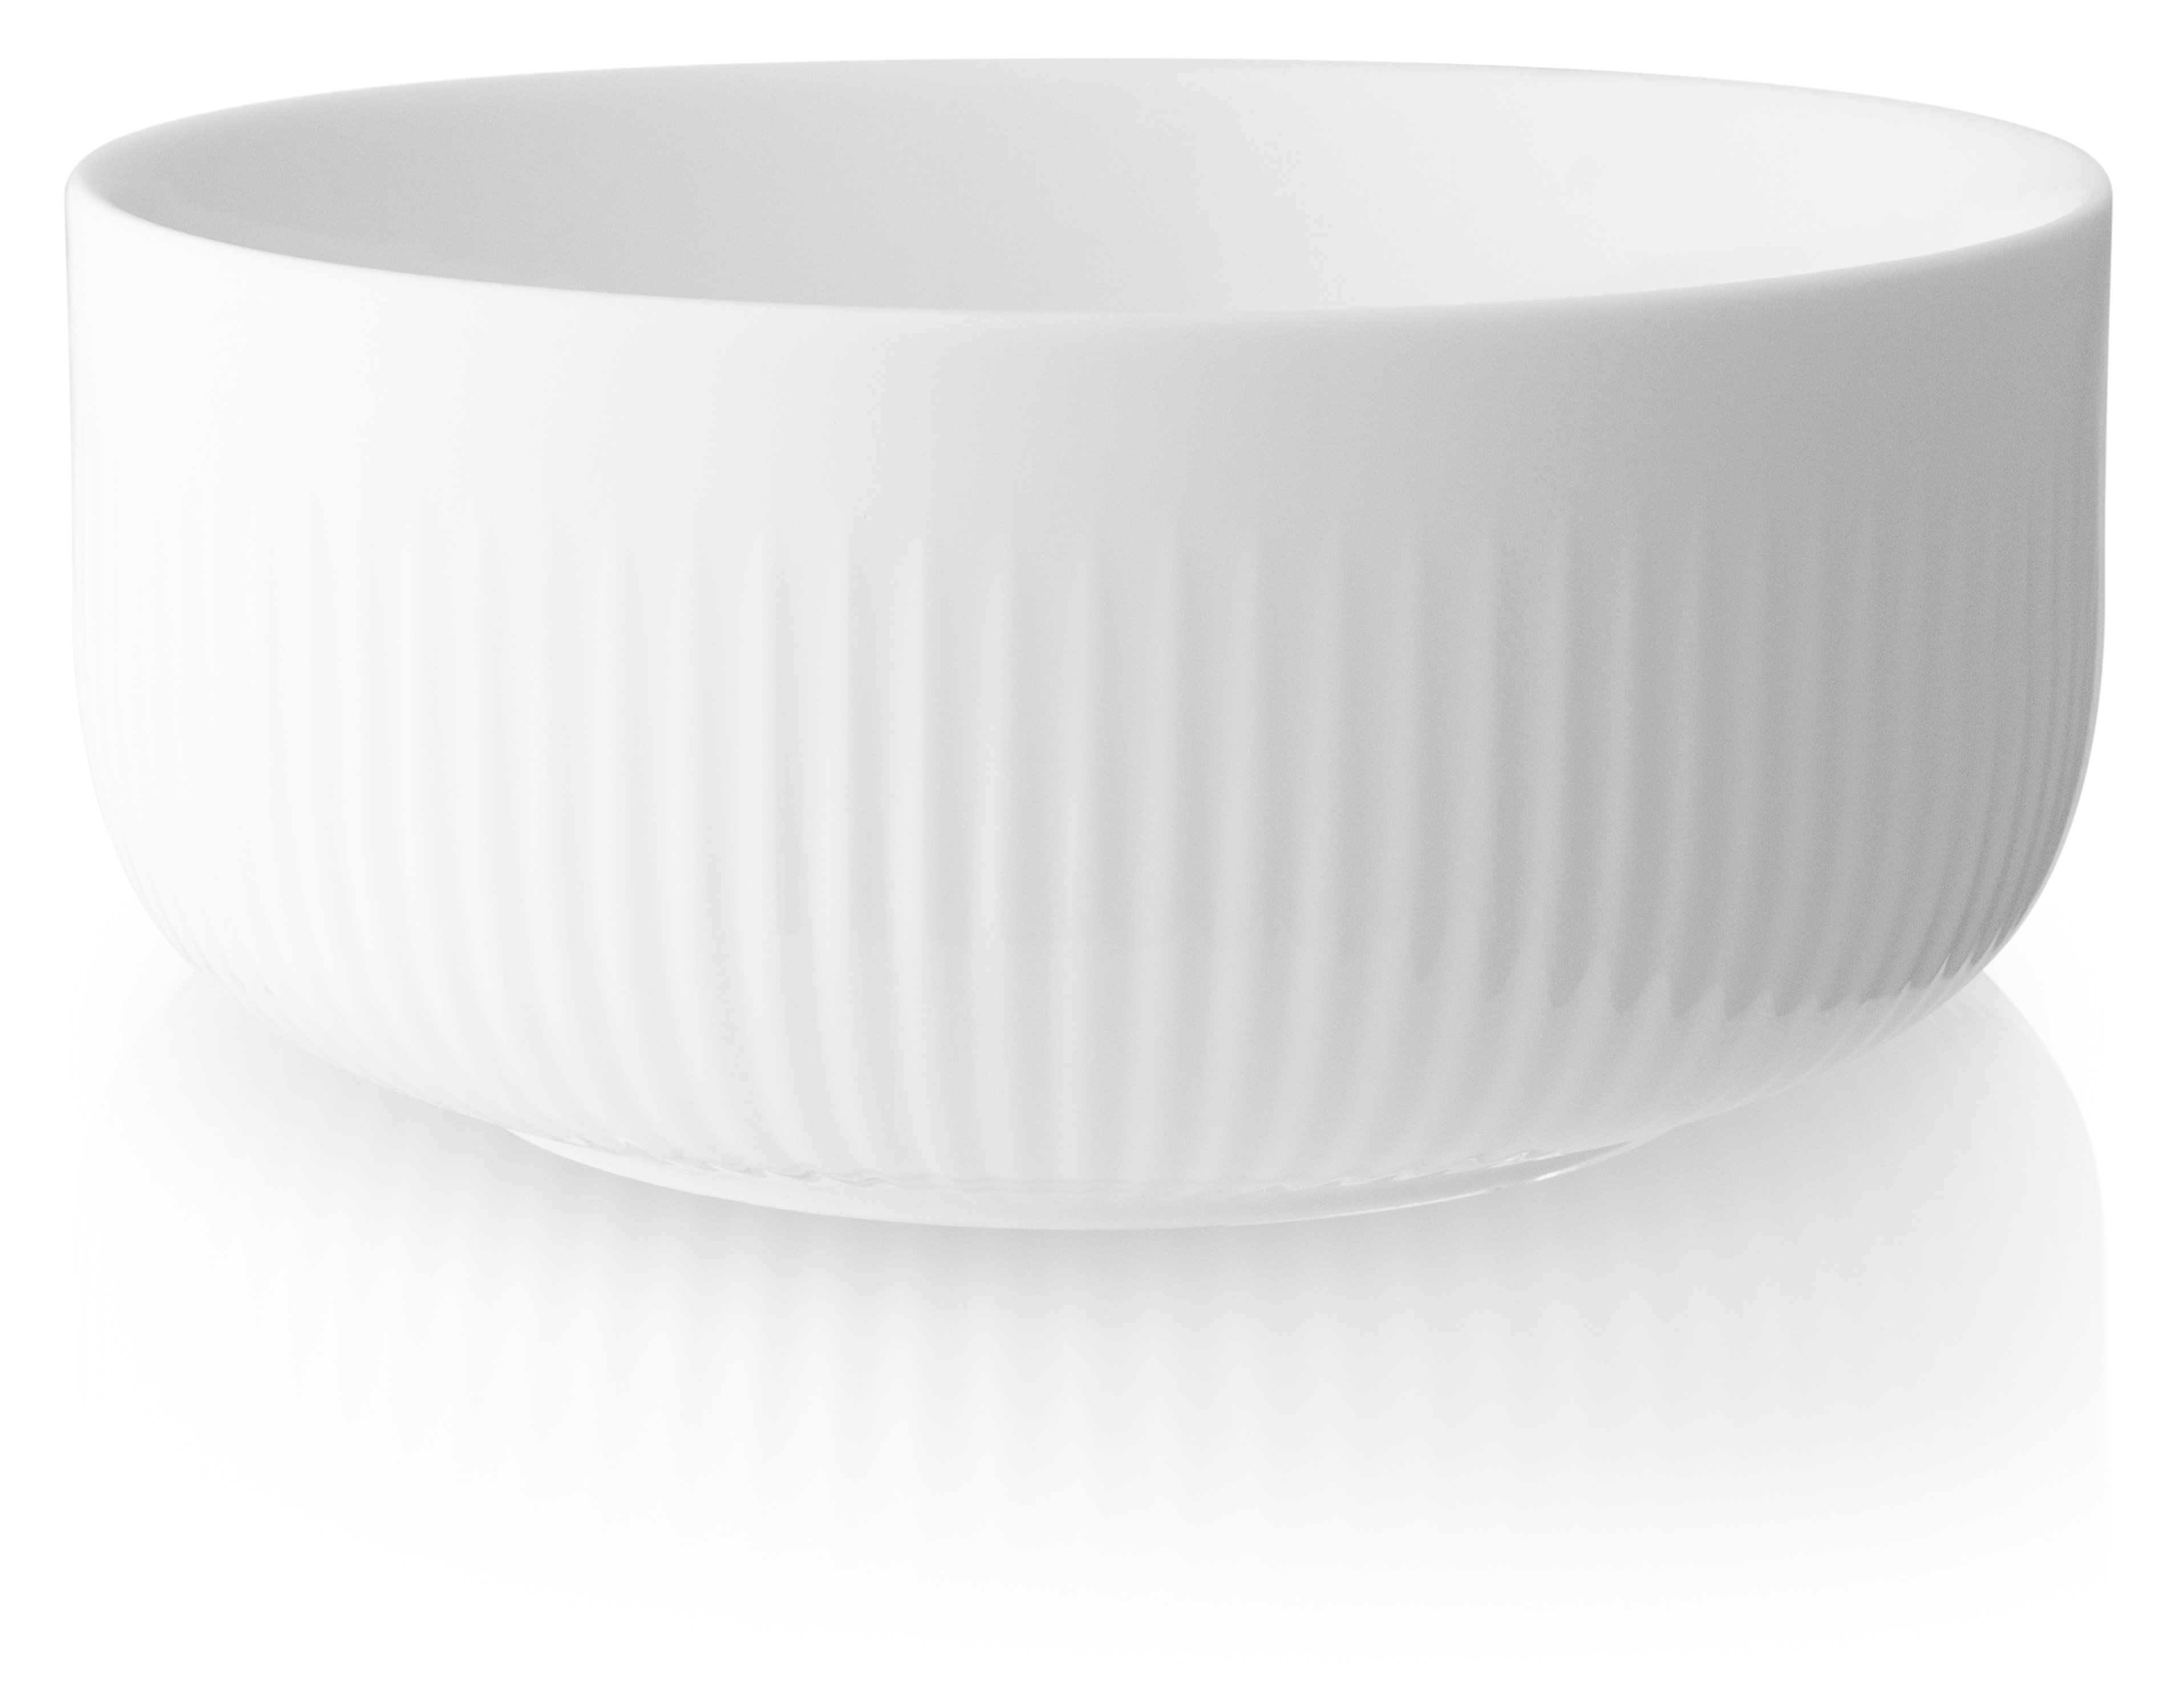 Eva Trio - Legio Nova Thermo Bowl Large 1,5 L - White (887303)